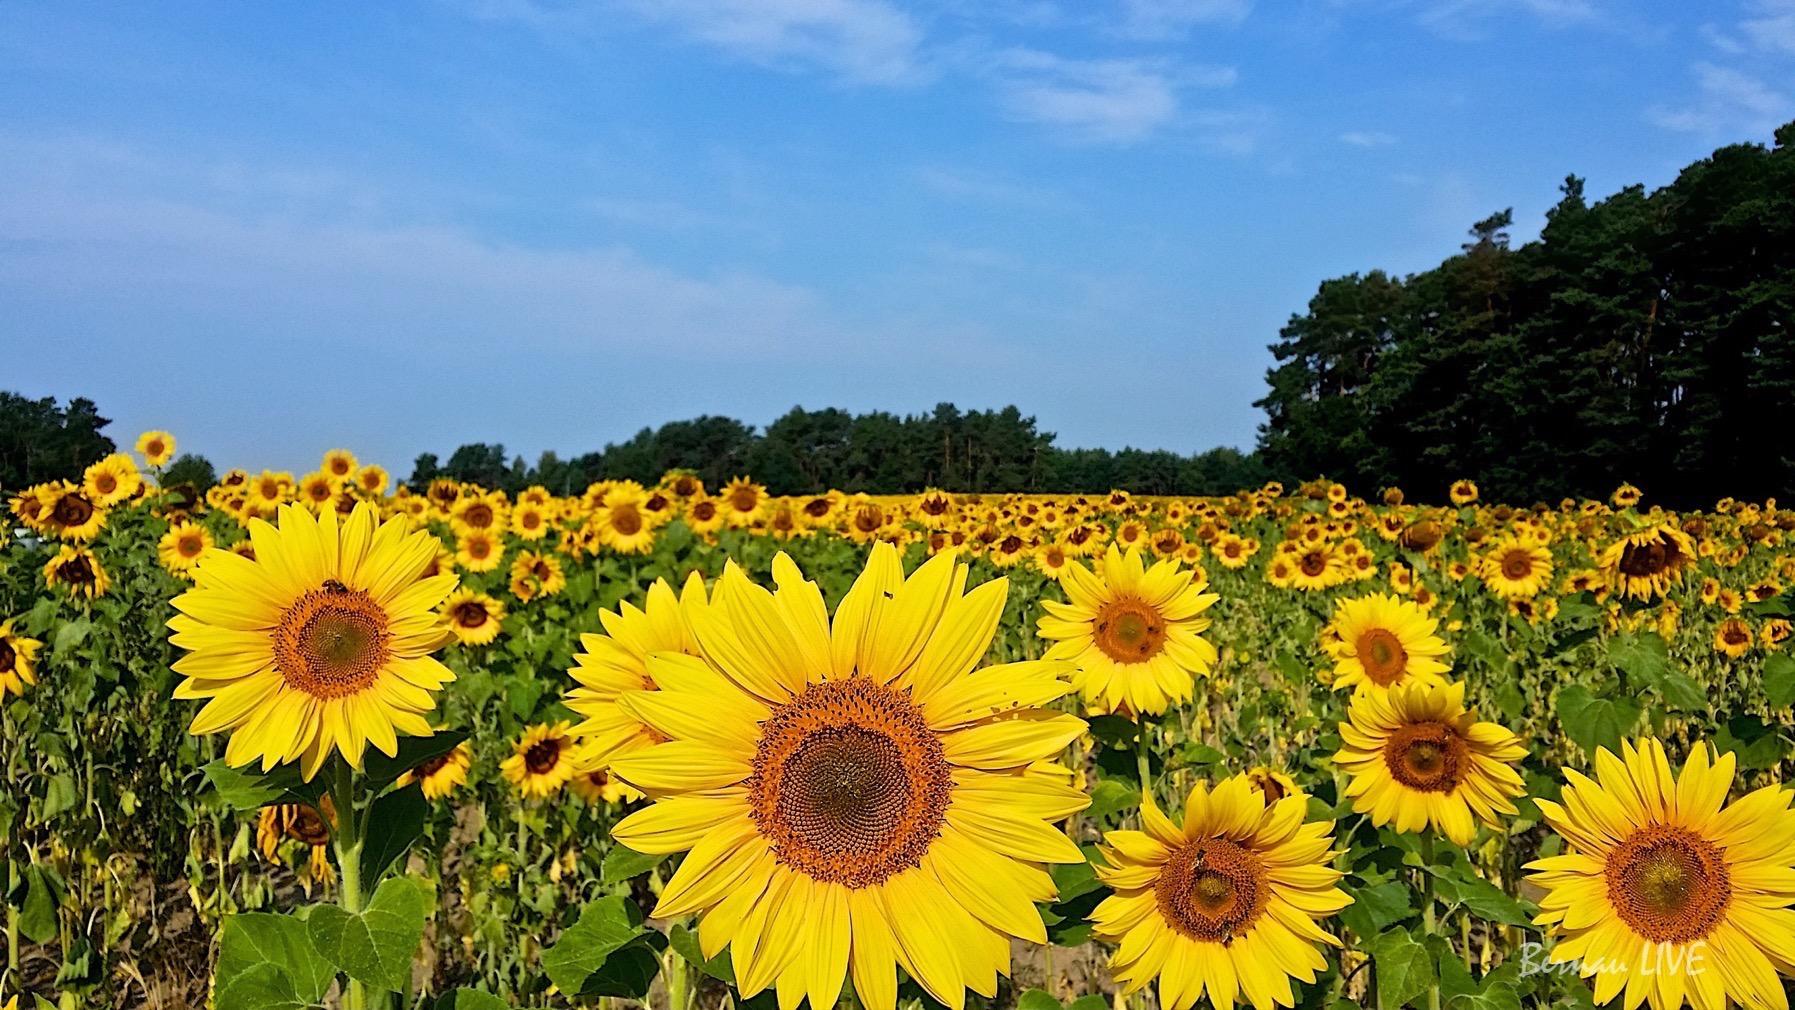 Bernau-Barnim, veranstaltungstipps, Wochenende, Sonnenblumen, Sommer, Barnim, Bernau, Bernau LIVE